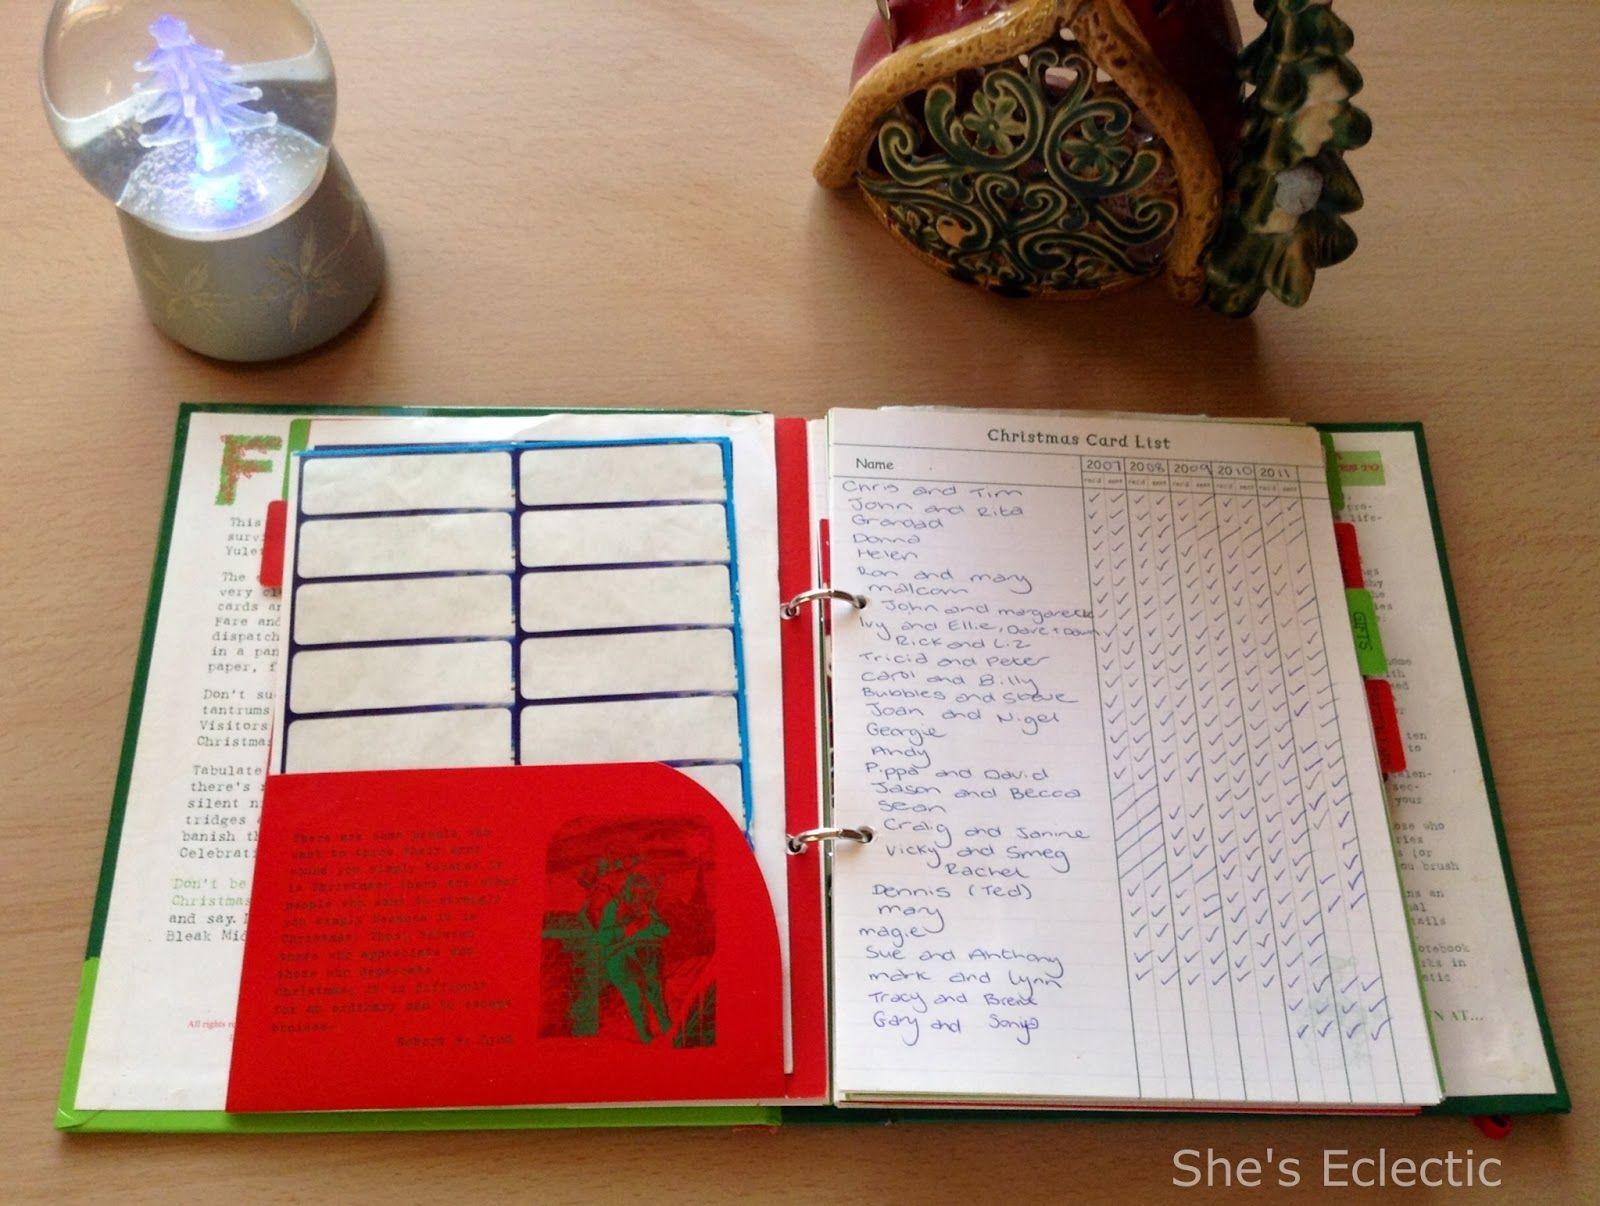 christmas card list sent and received dodo book of christmas